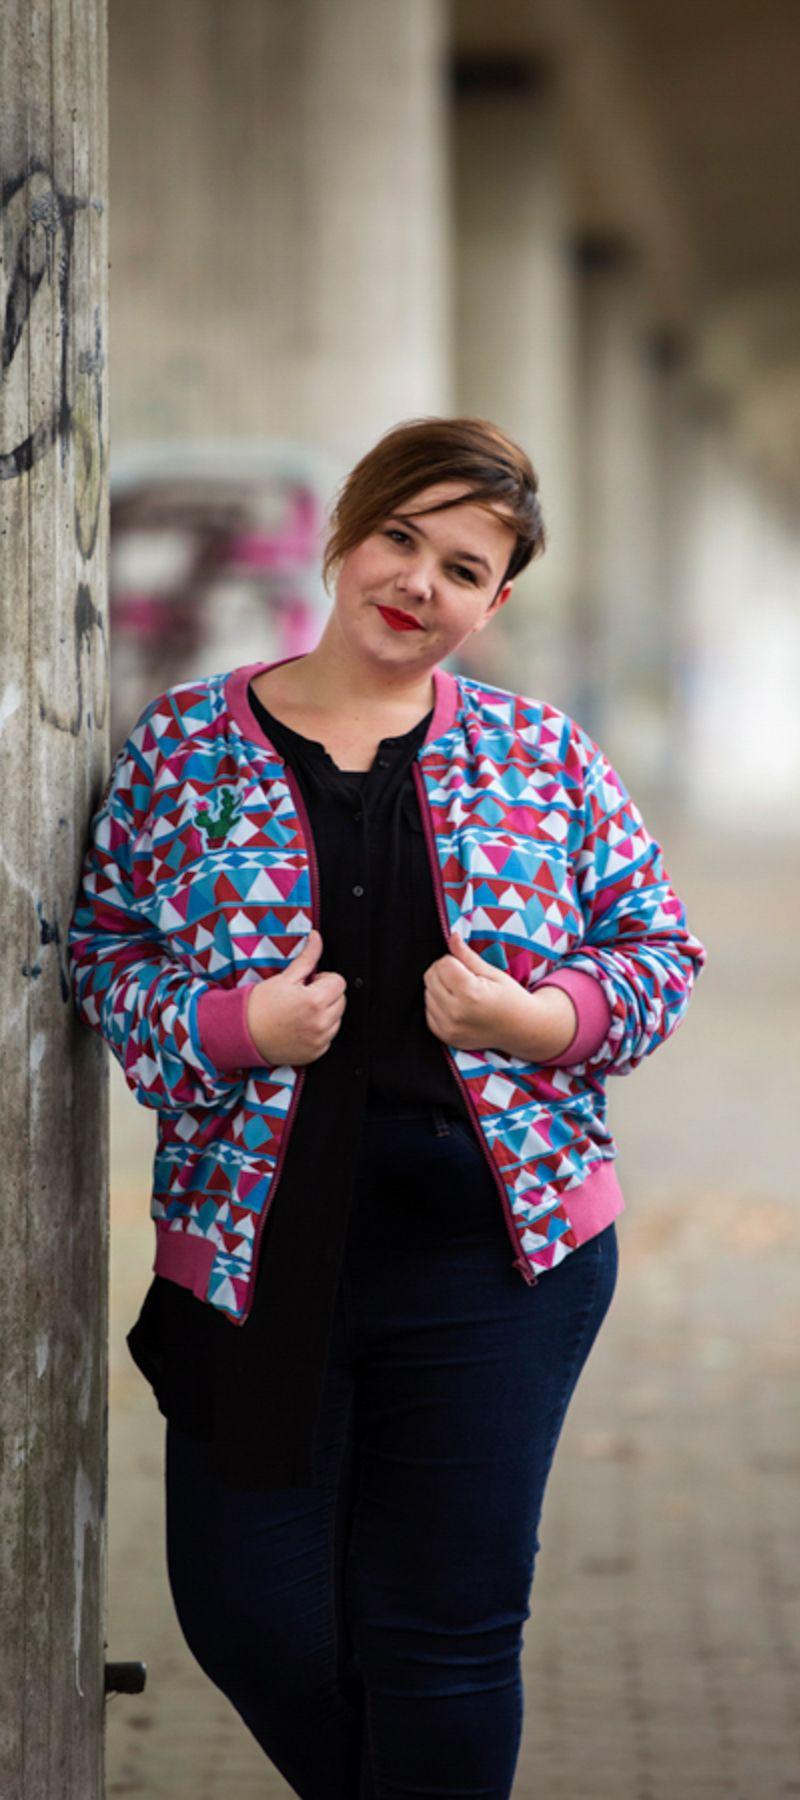 Schnittmuster Blouson MAneela - Trage was du magst! | DIY fashion